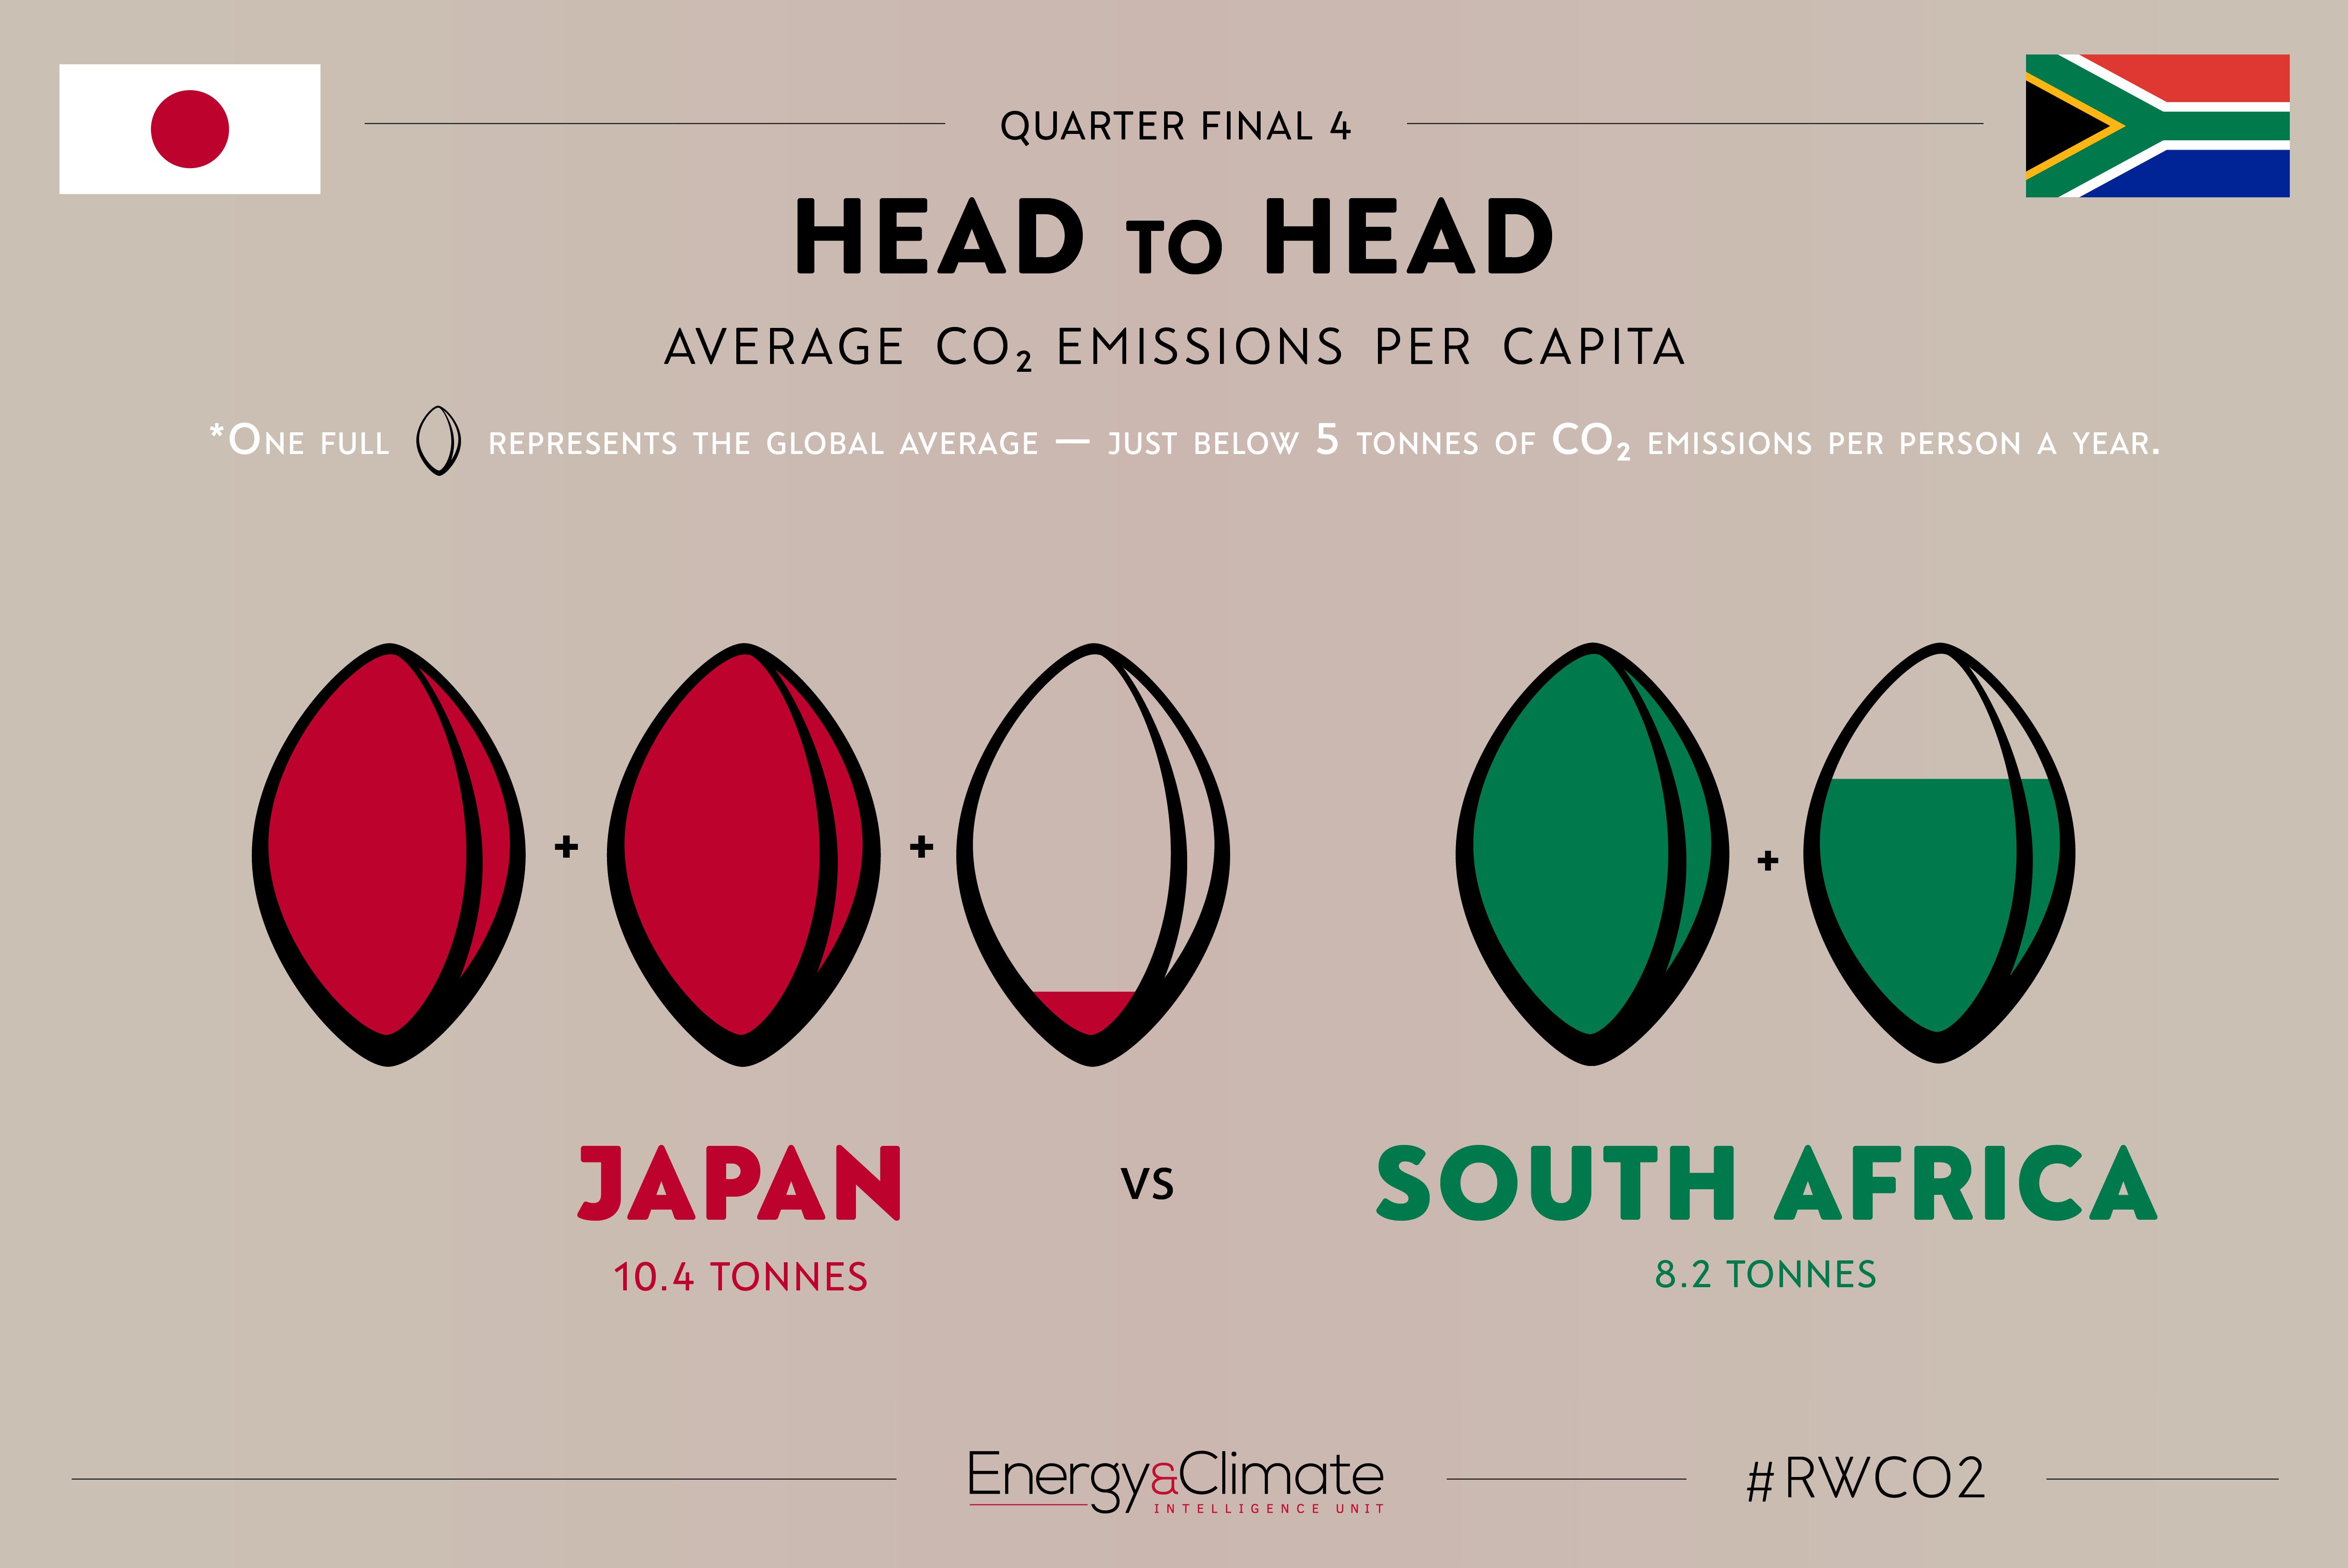 Japan v South Africa - per capita emissions